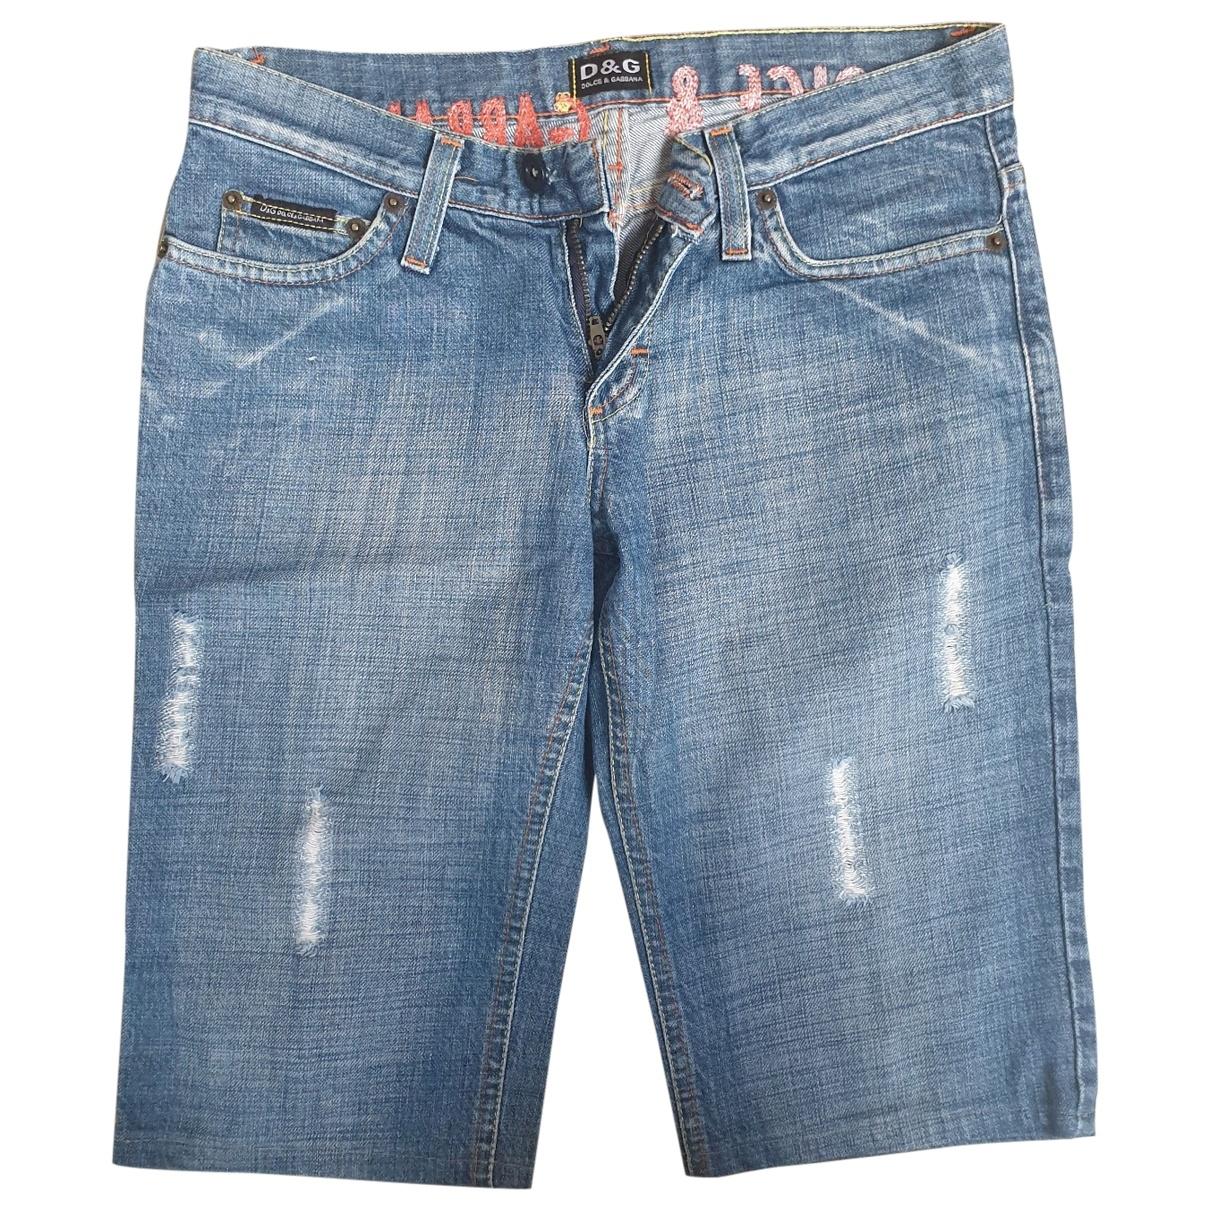 D&g \N Blue Cotton Shorts for Women 44 FR